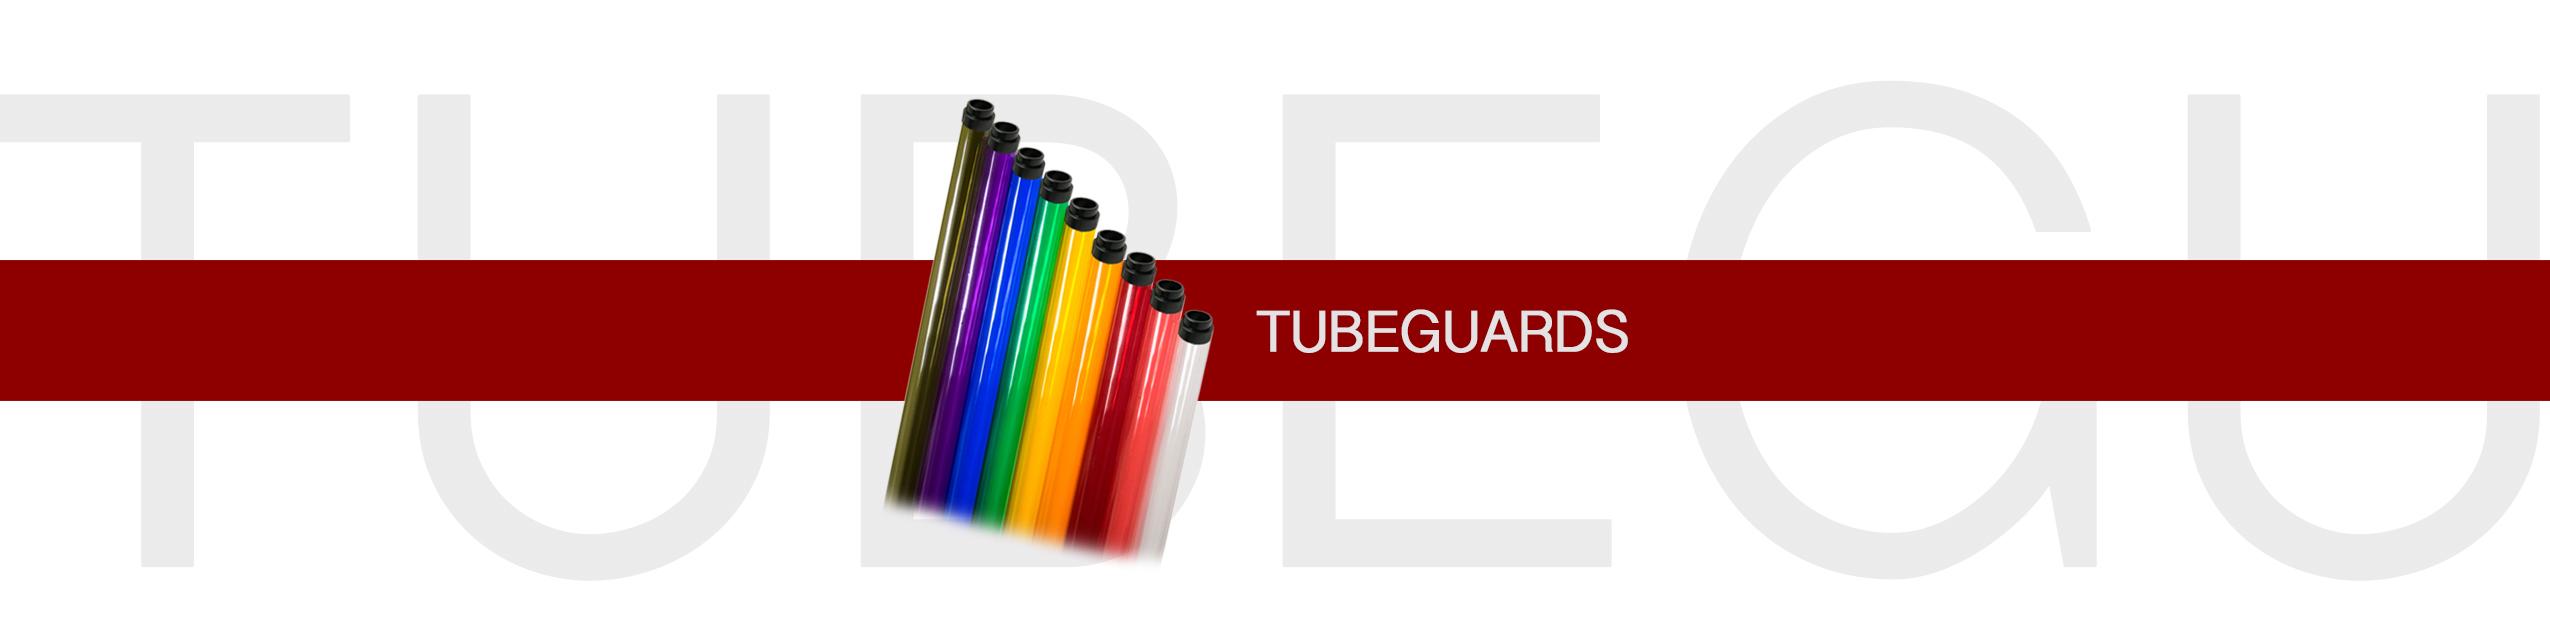 TUBEGUARDS BANNER